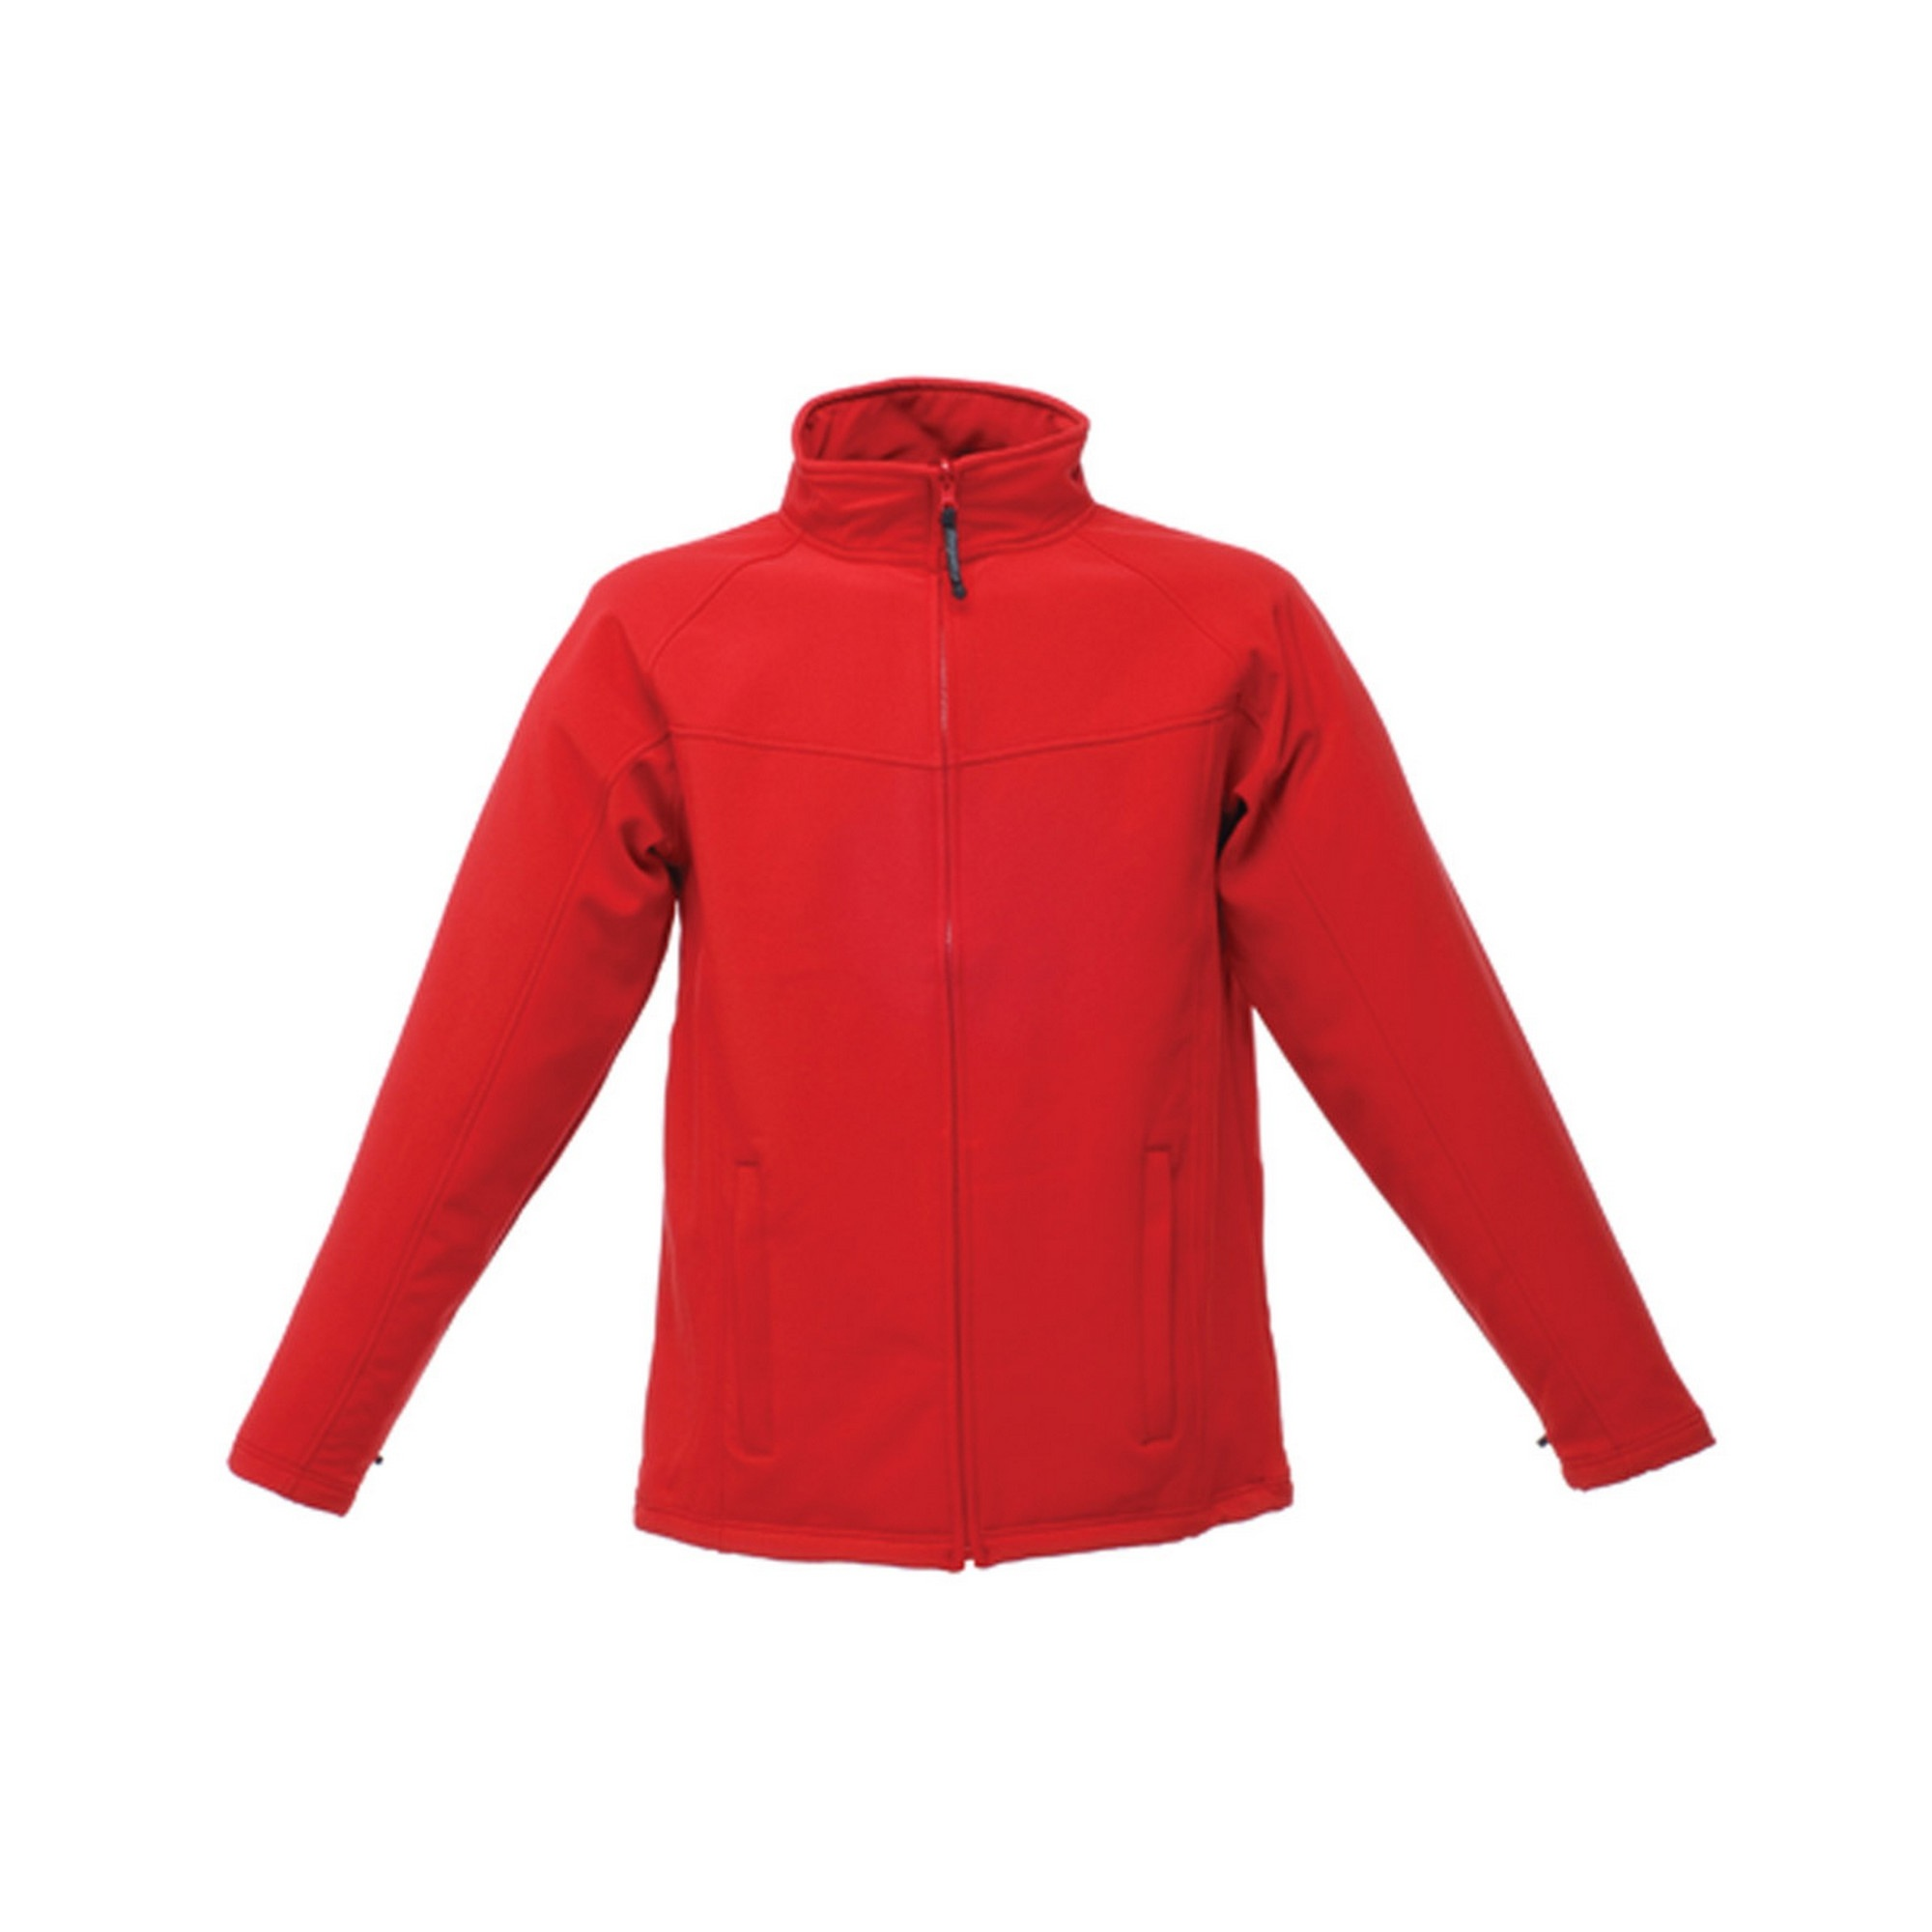 Regatta Professional Mens Uproar Softshell Wind Resistant Fleece Jacket (2XL) (Classic Red/Seal Grey)